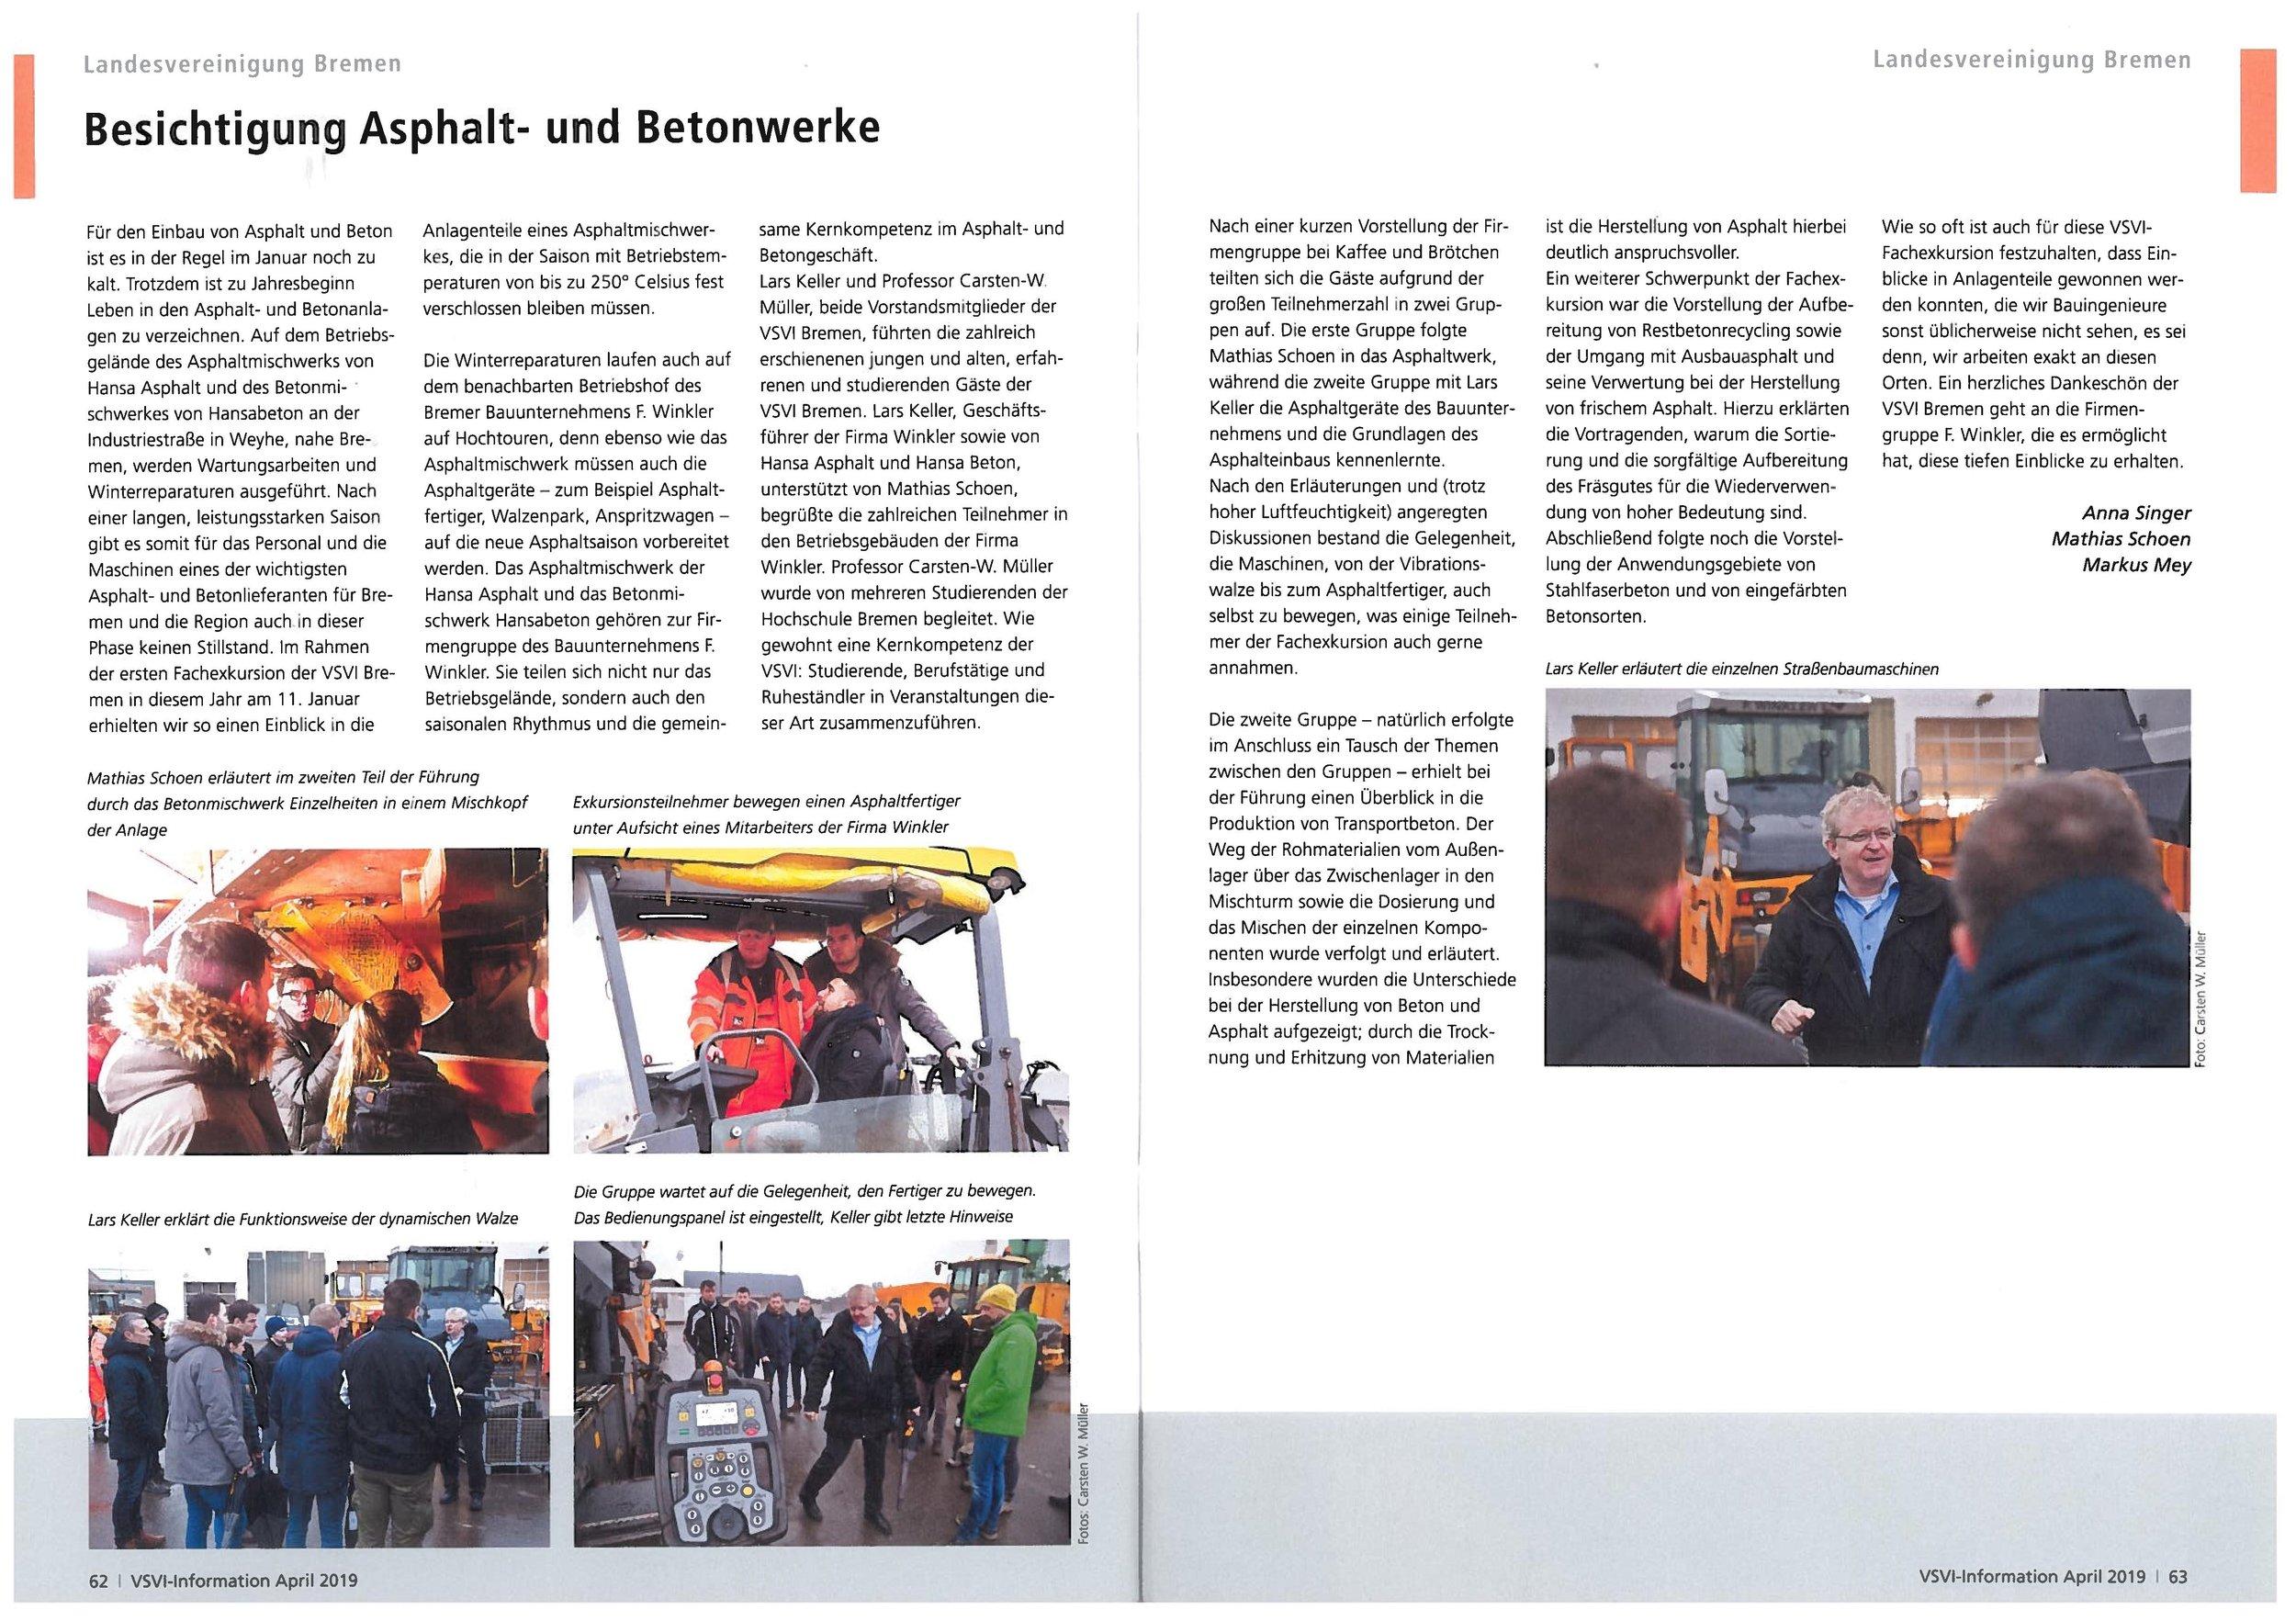 PDF_2019-05-08_14_25_44-page-001.jpg